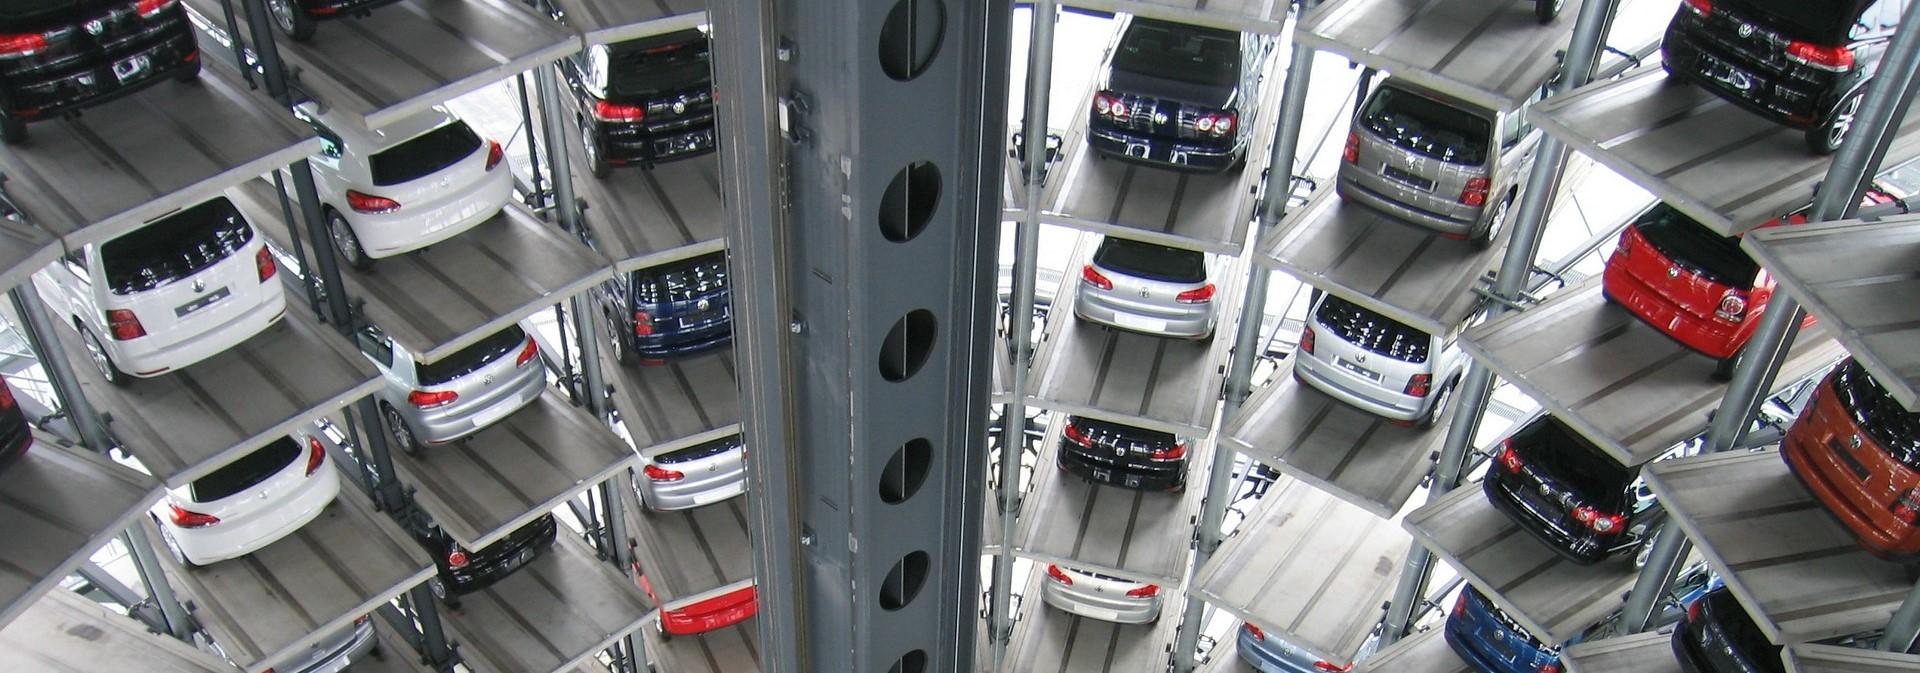 Multi-Storey Car Park - GWCars.org